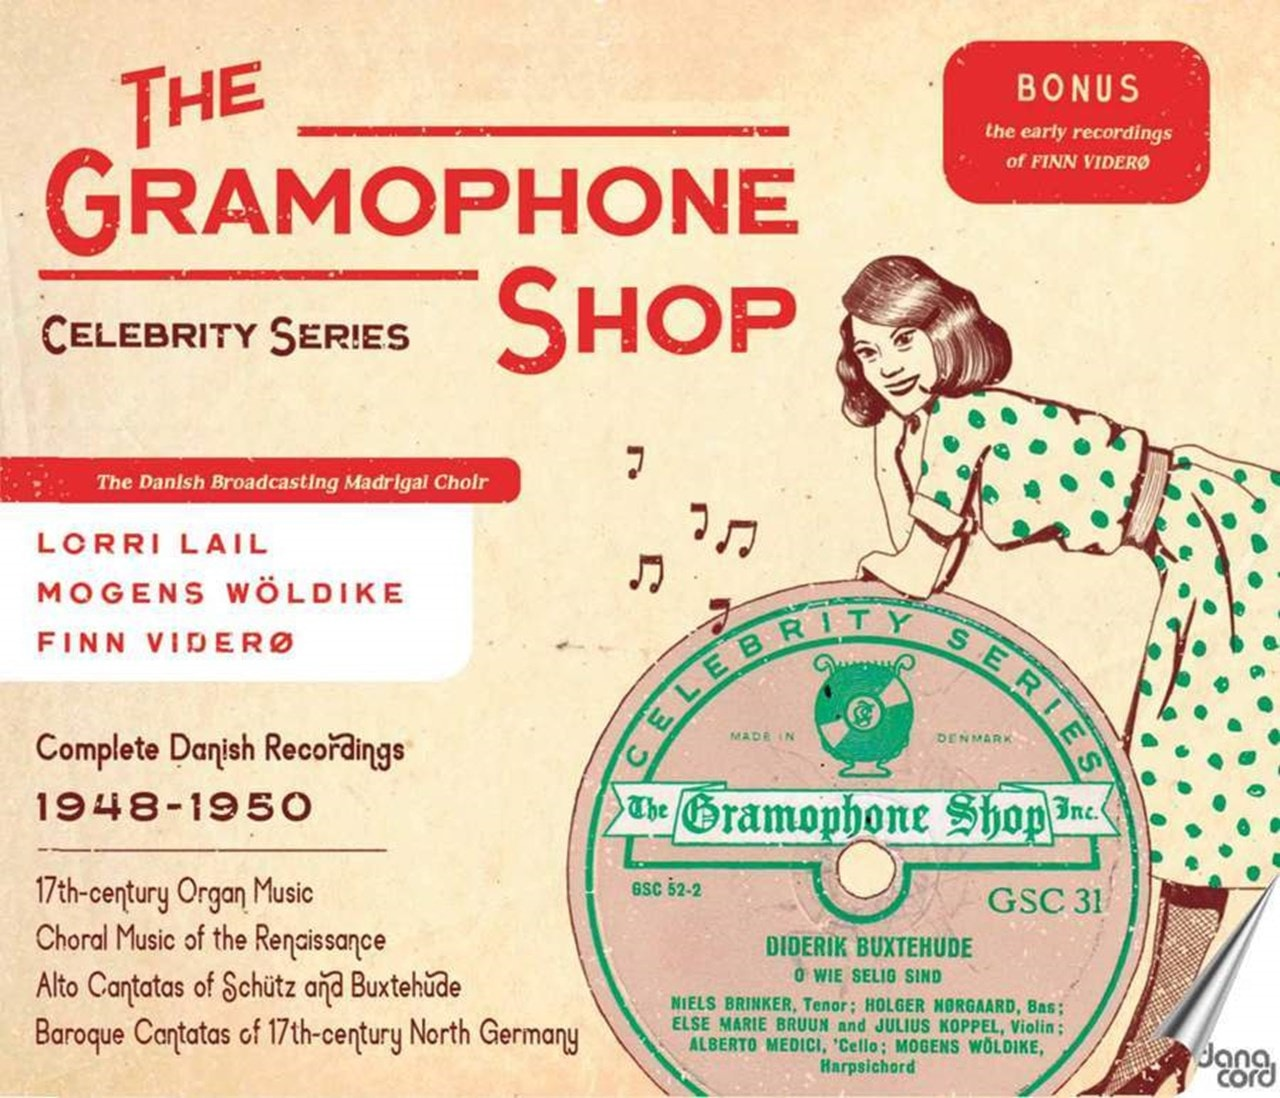 The Gramophone Shop: Celebrity Series: Complete Danish Recordings 1948-1950 - 1